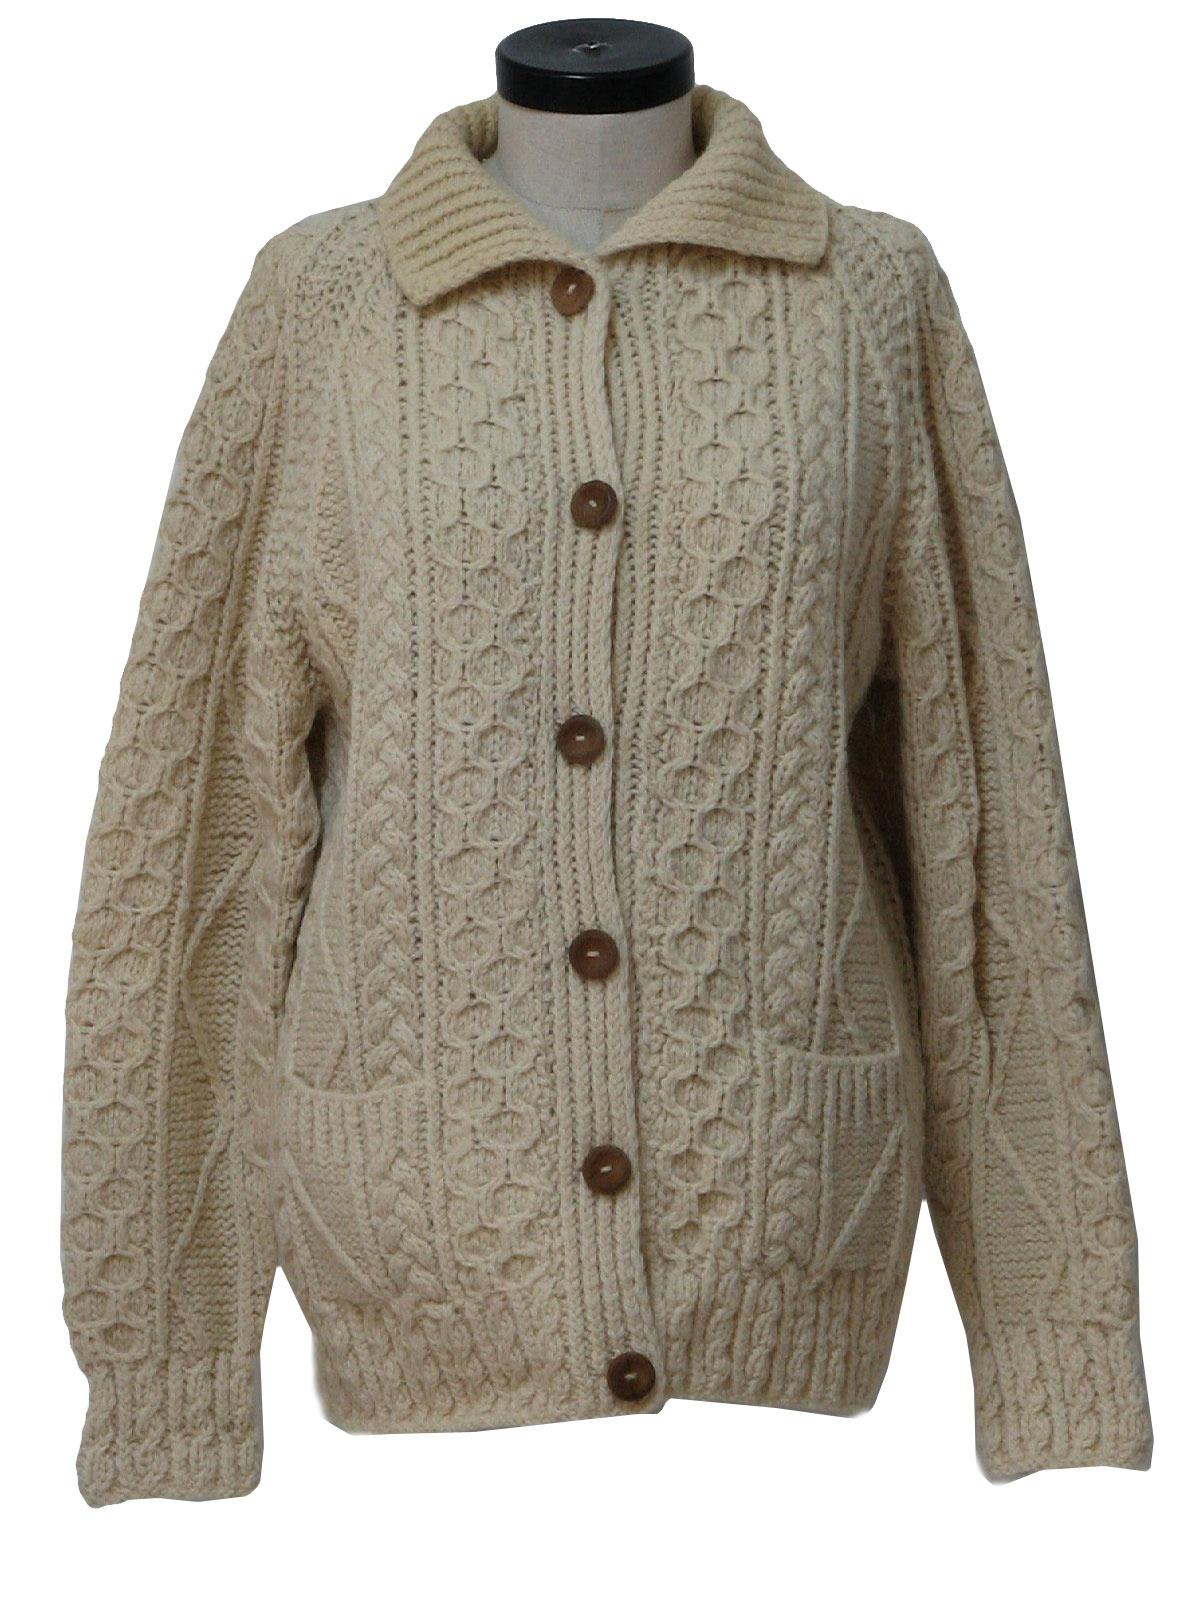 Retro 1970's Caridgan Sweater (Loch Garman) : 70s authentic ...